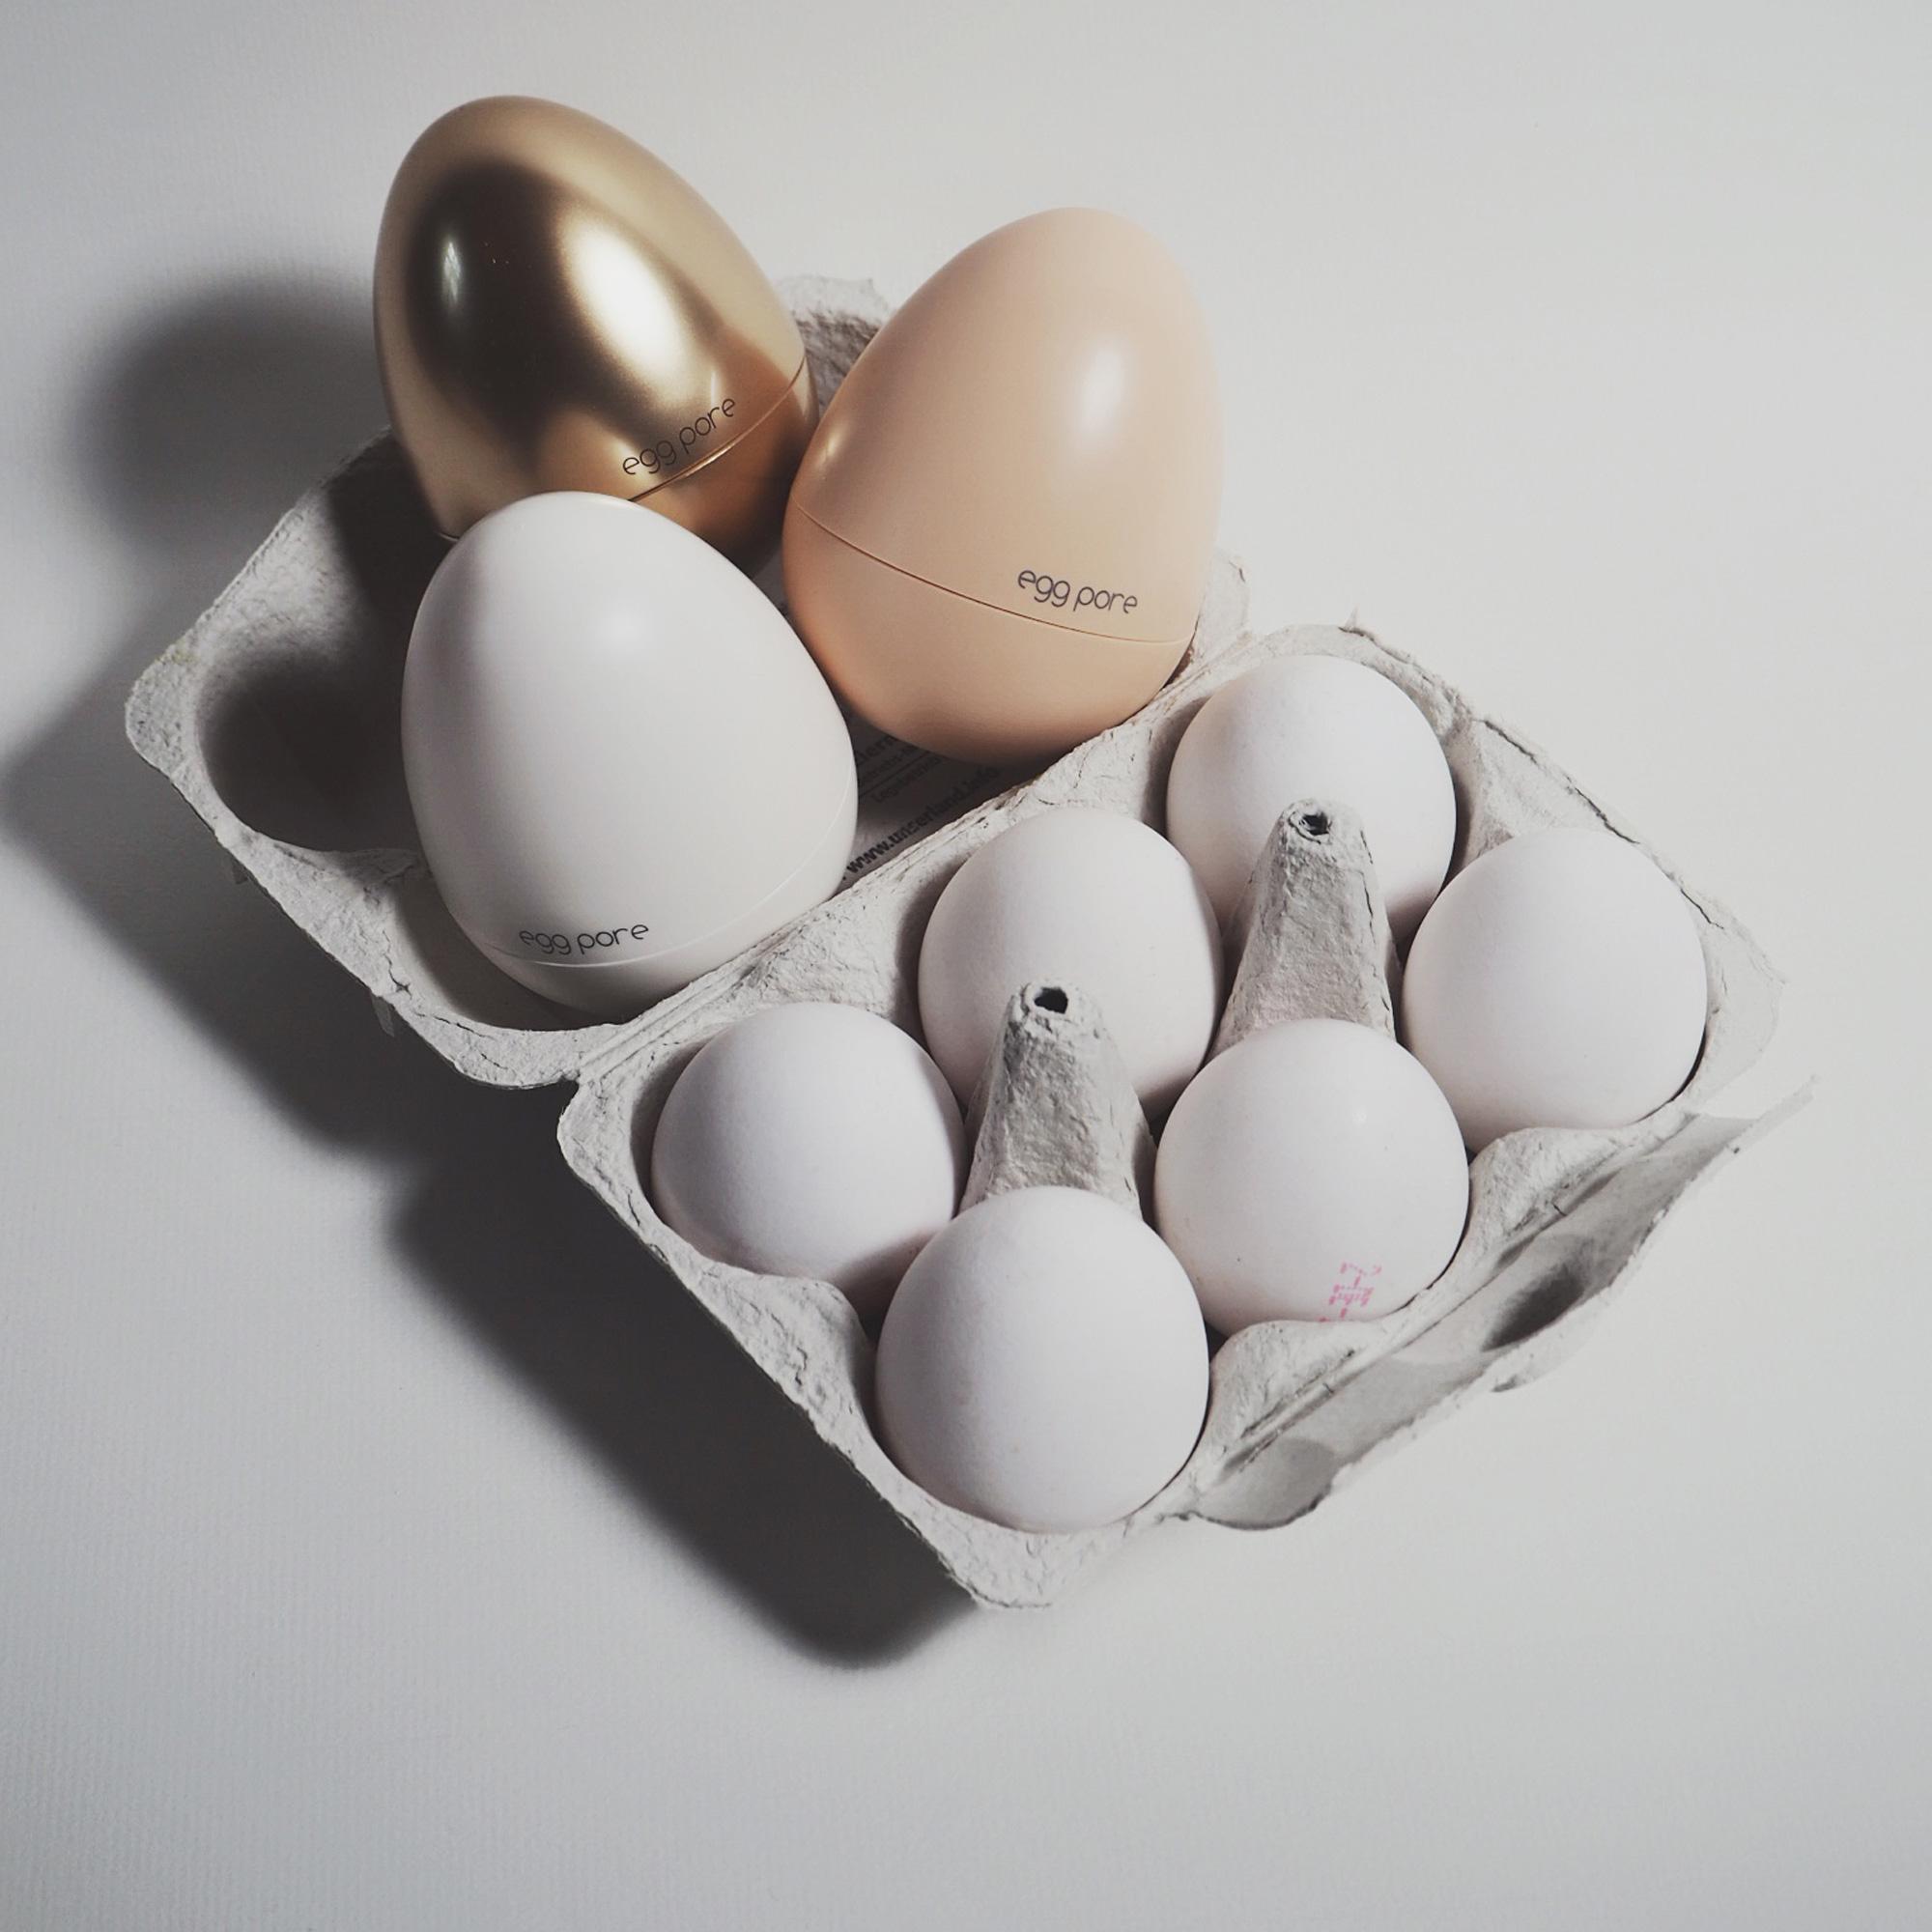 Egg Pore von Tony Moly